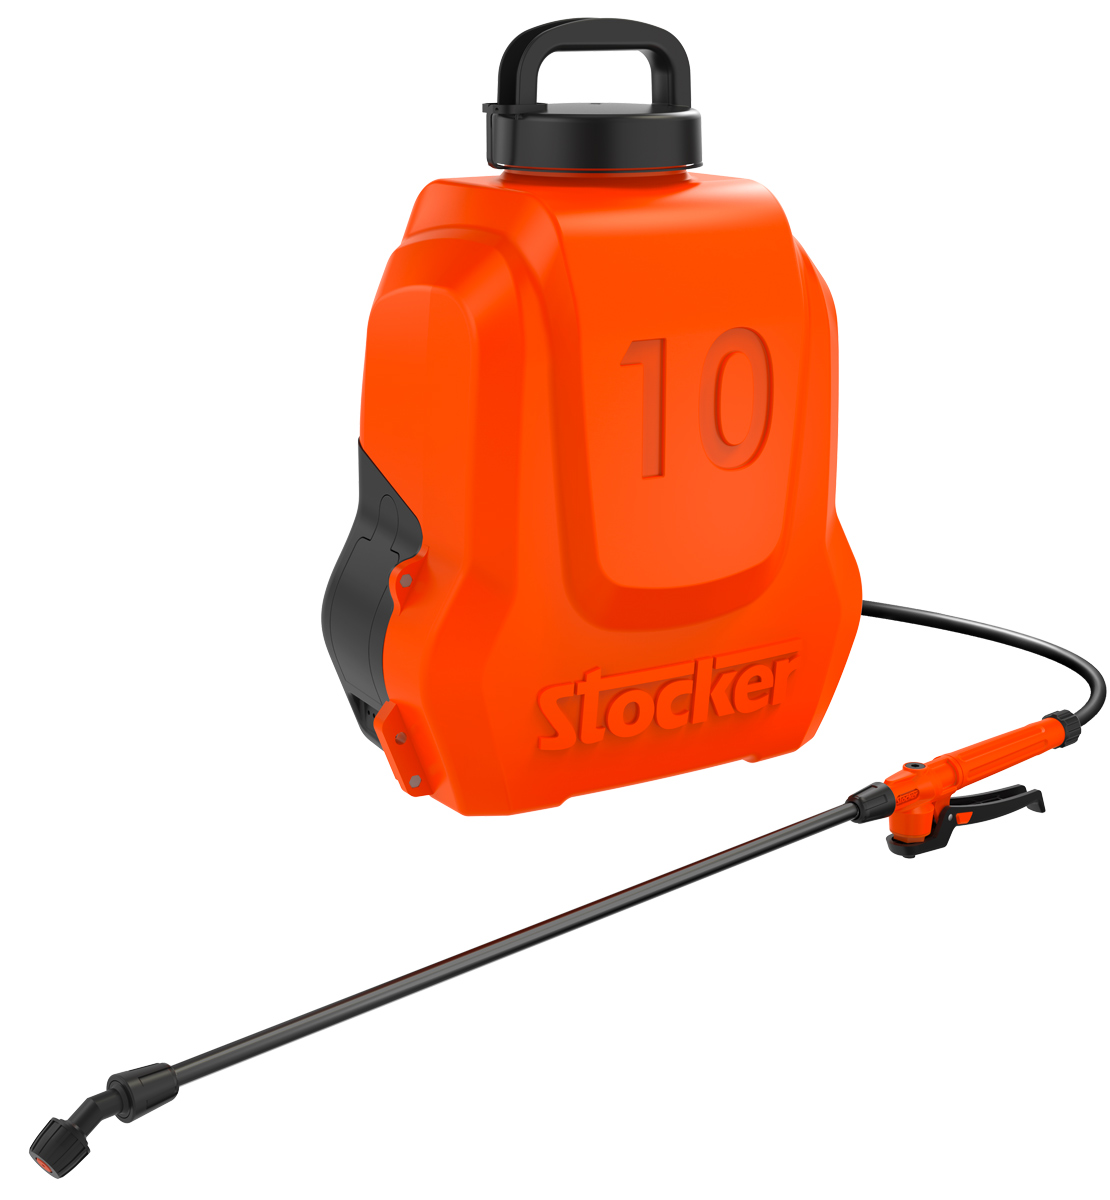 238-pompa-irroratrice-elettrica-a-zaino-li-ion-stocker-10-litri